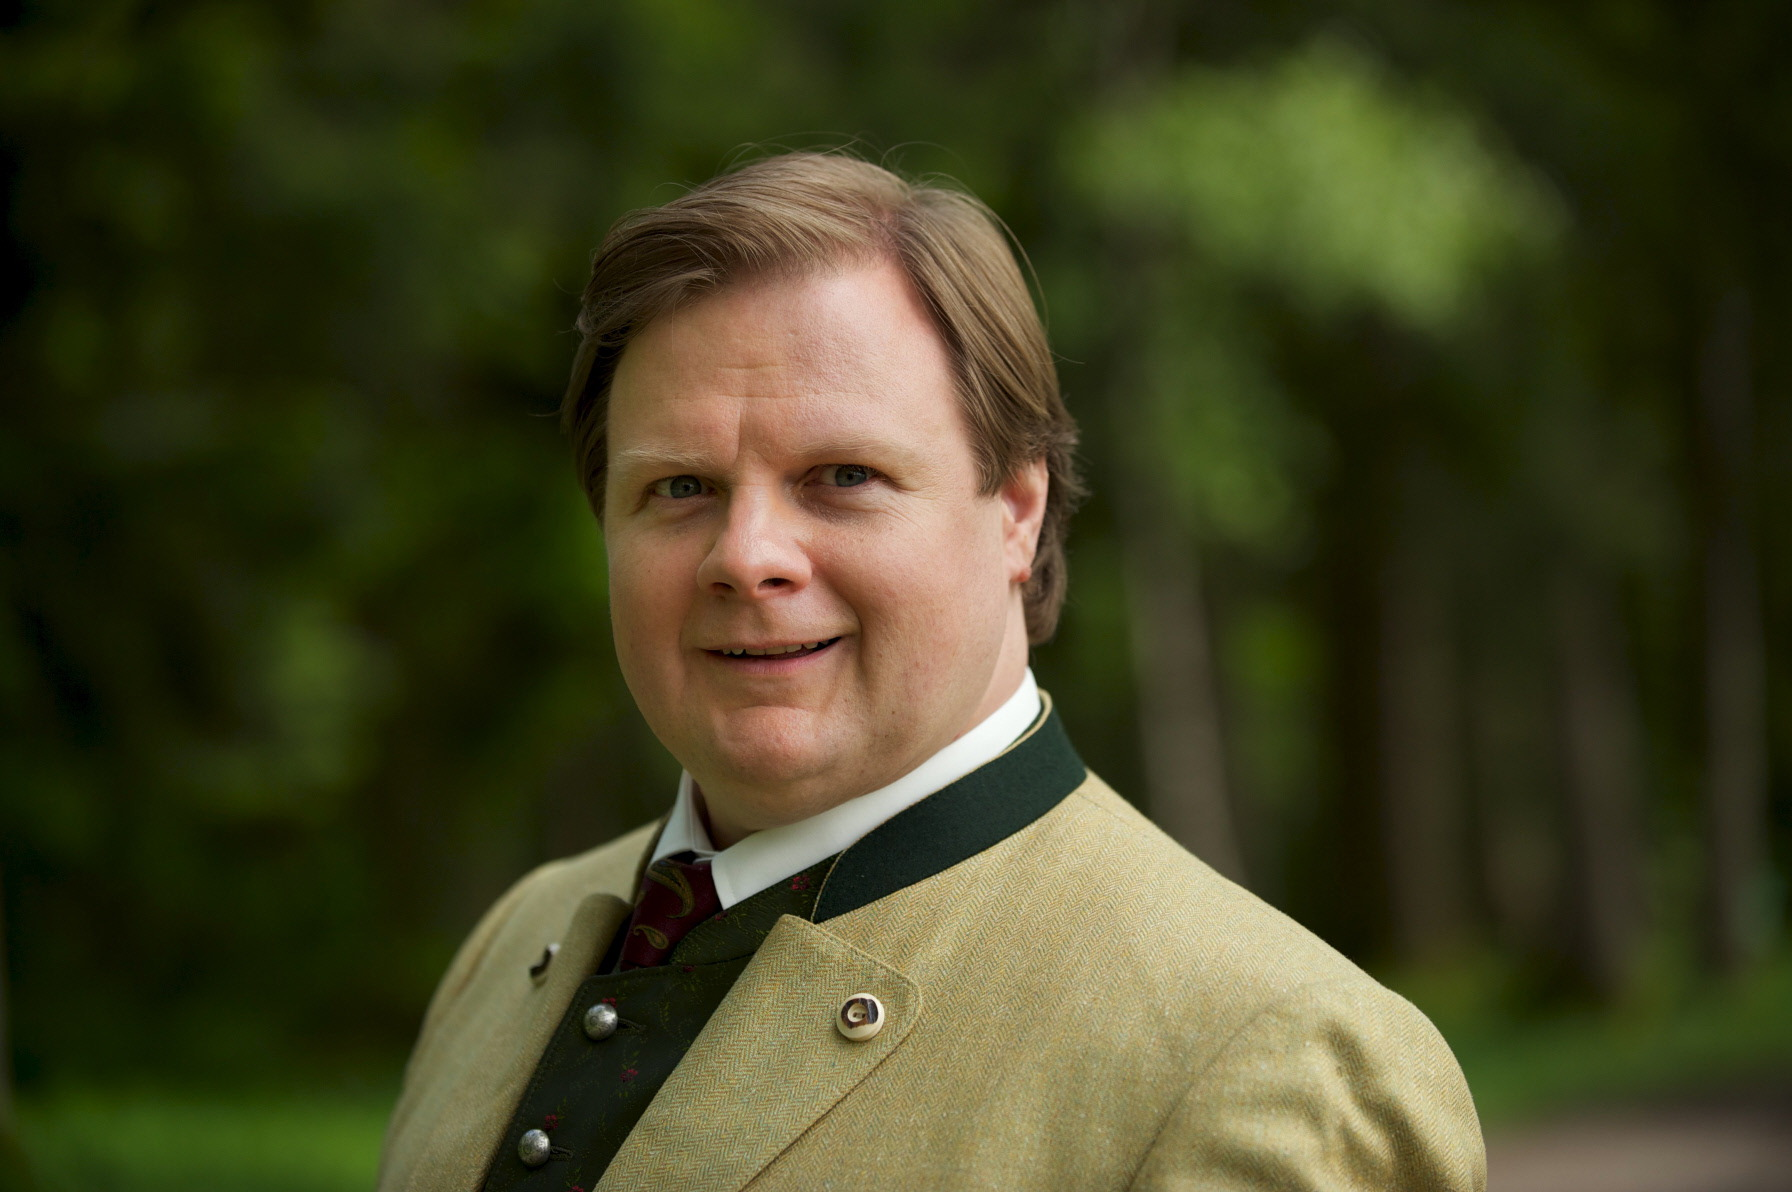 Michael A. Grimm